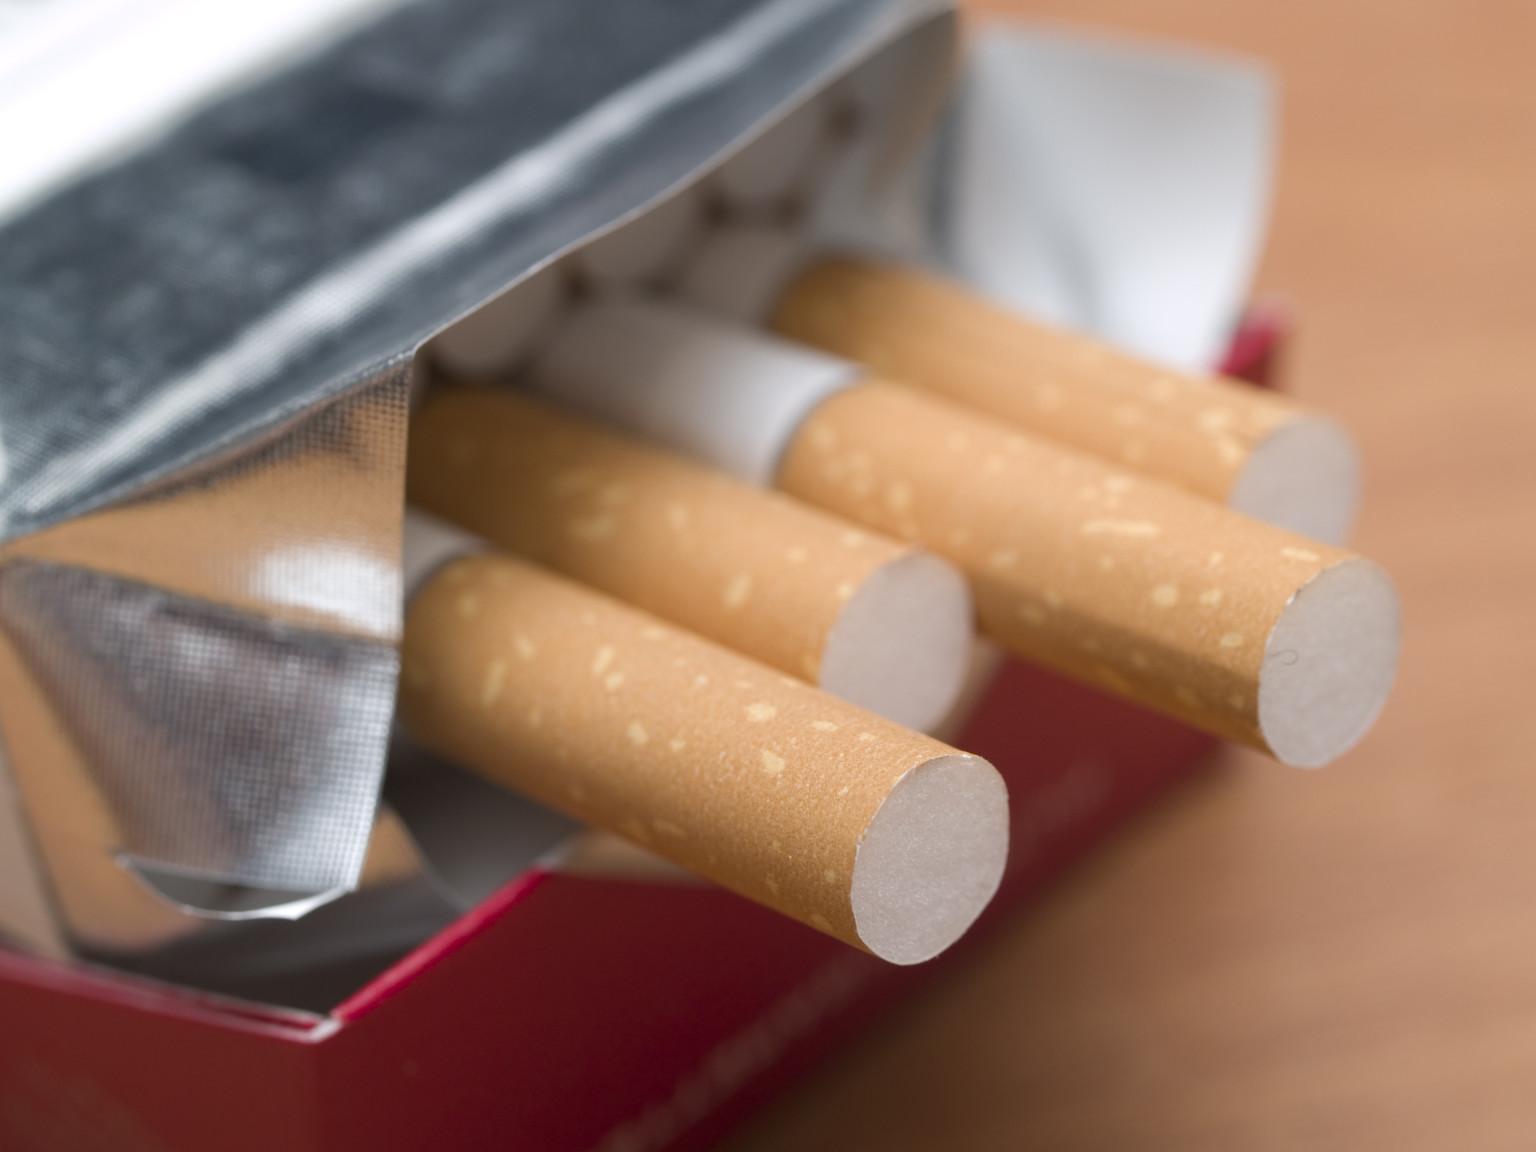 Cheap cigarettes Kent Glasgow